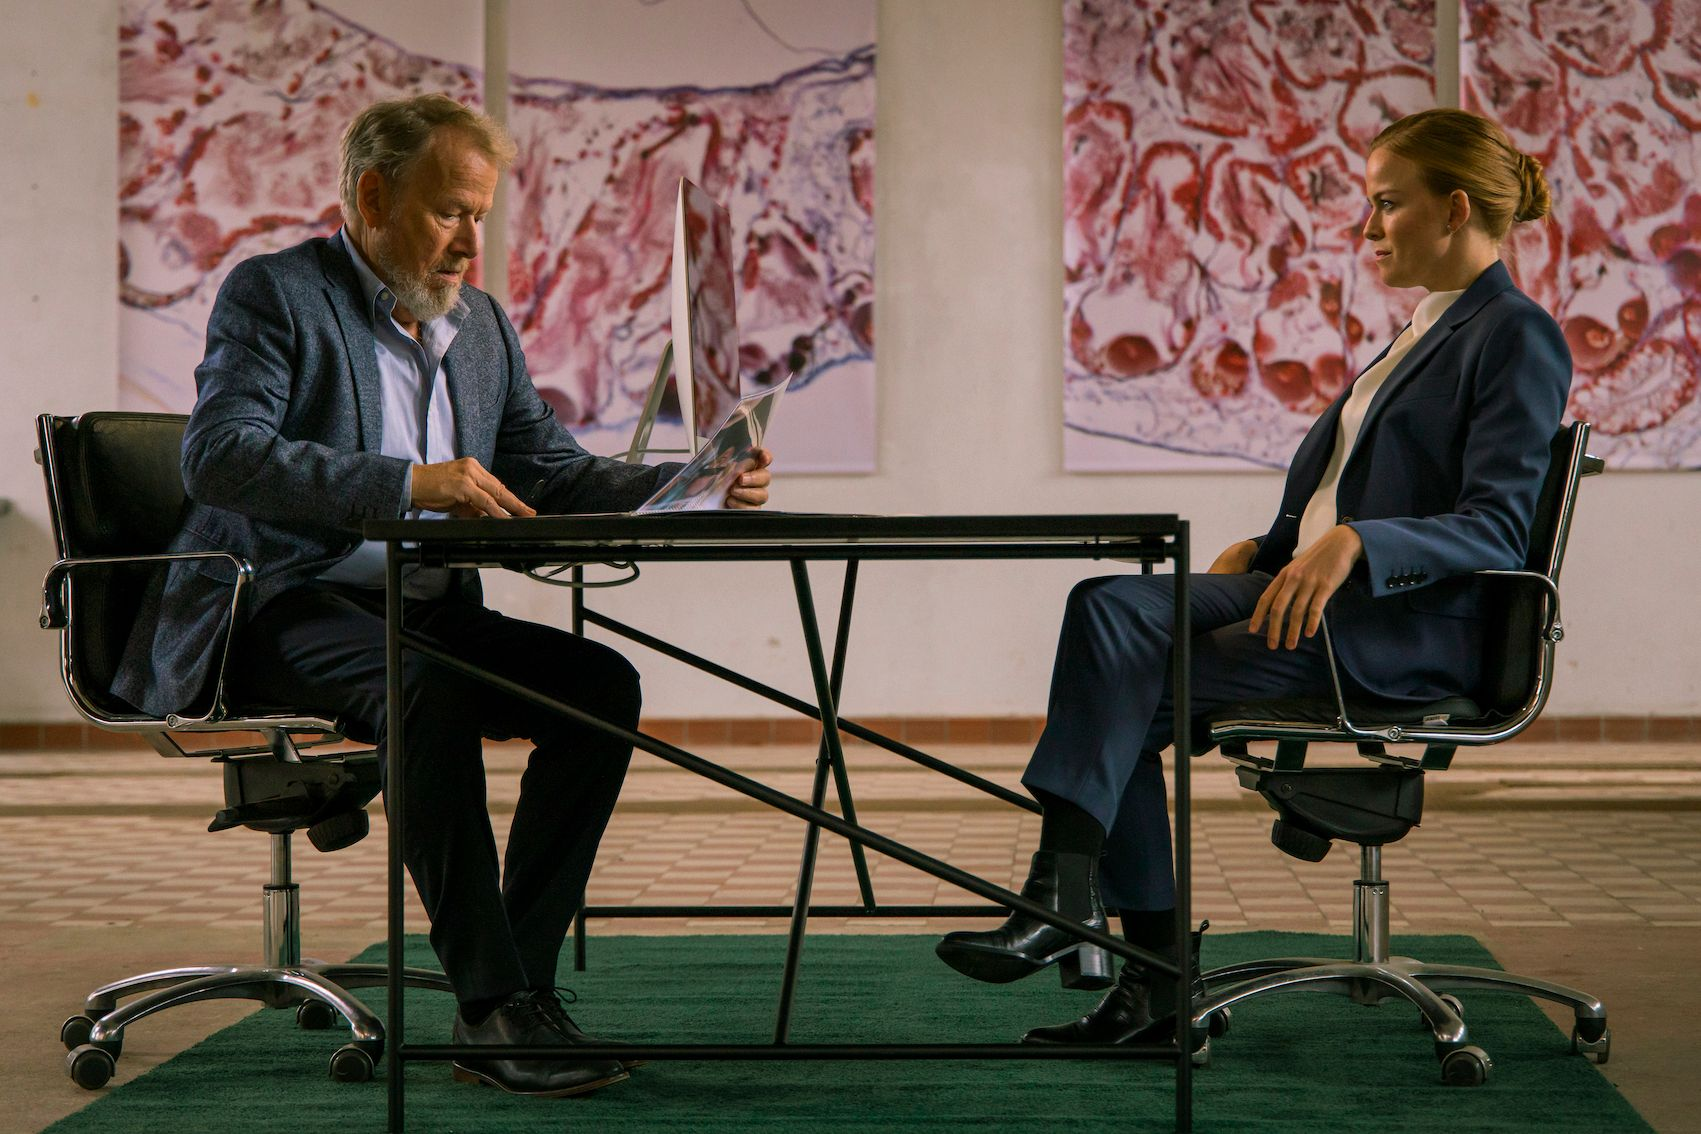 Anders Heinrichsen e Signe Egholm Olsen